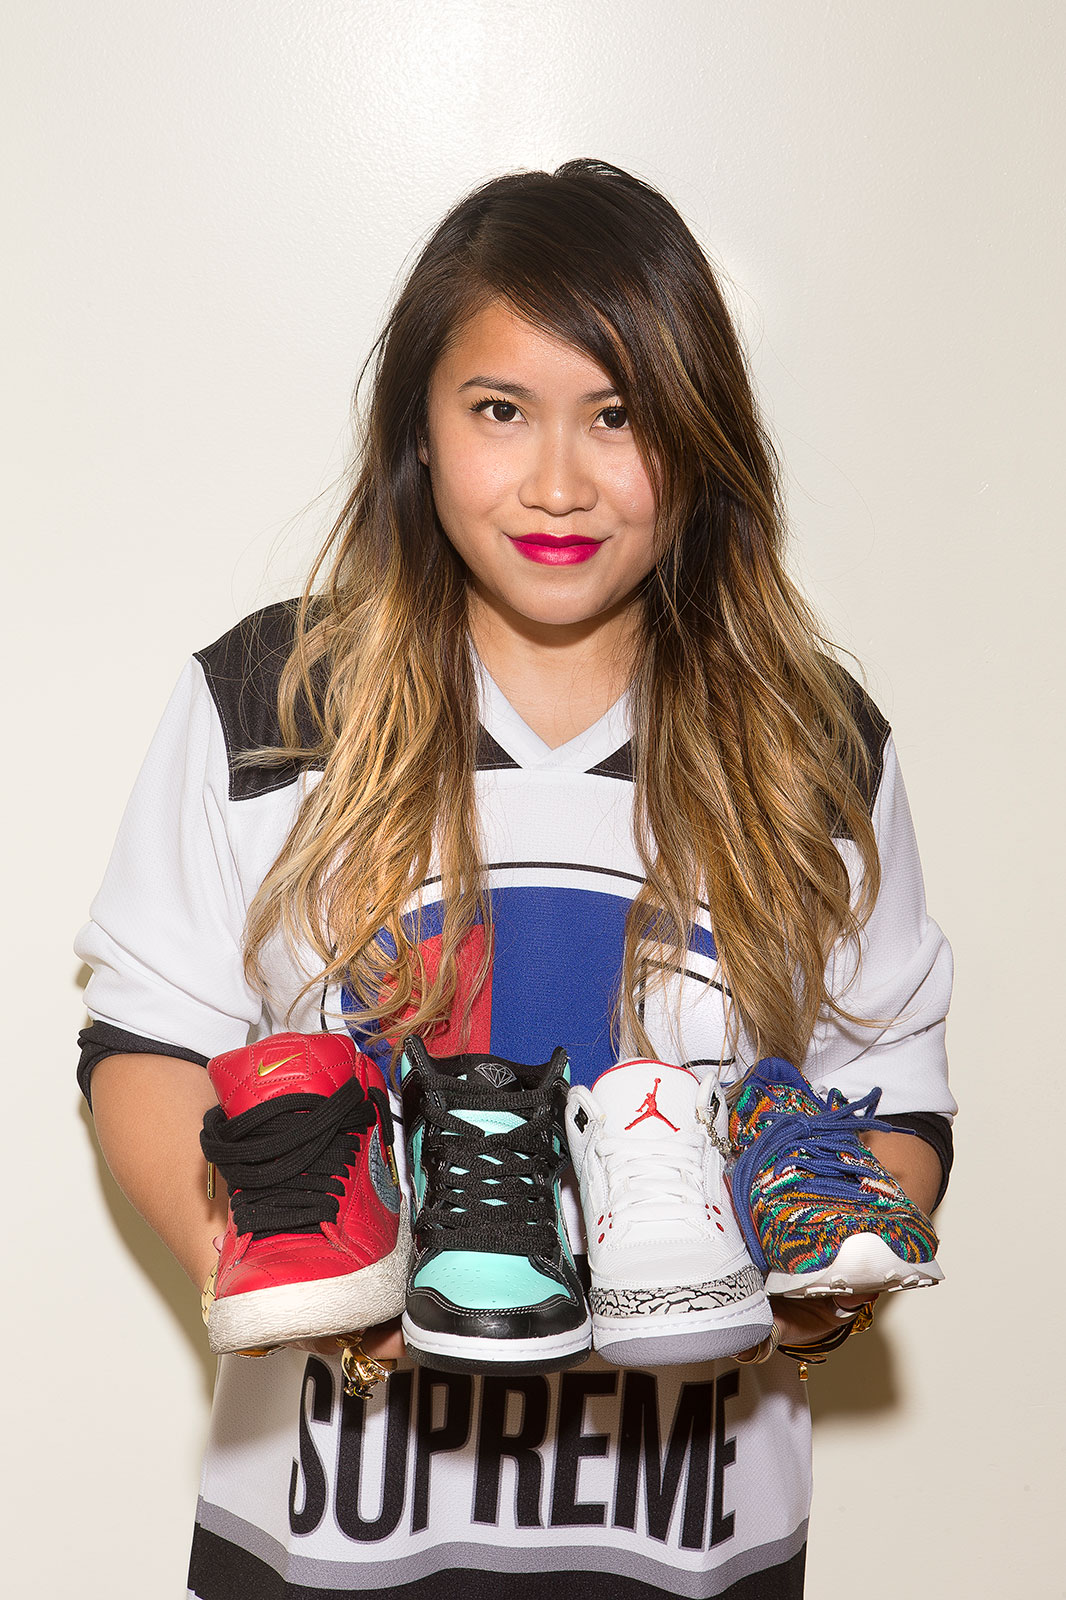 My Sneaker Closet featured on Refinery29 - nitrolicious.com